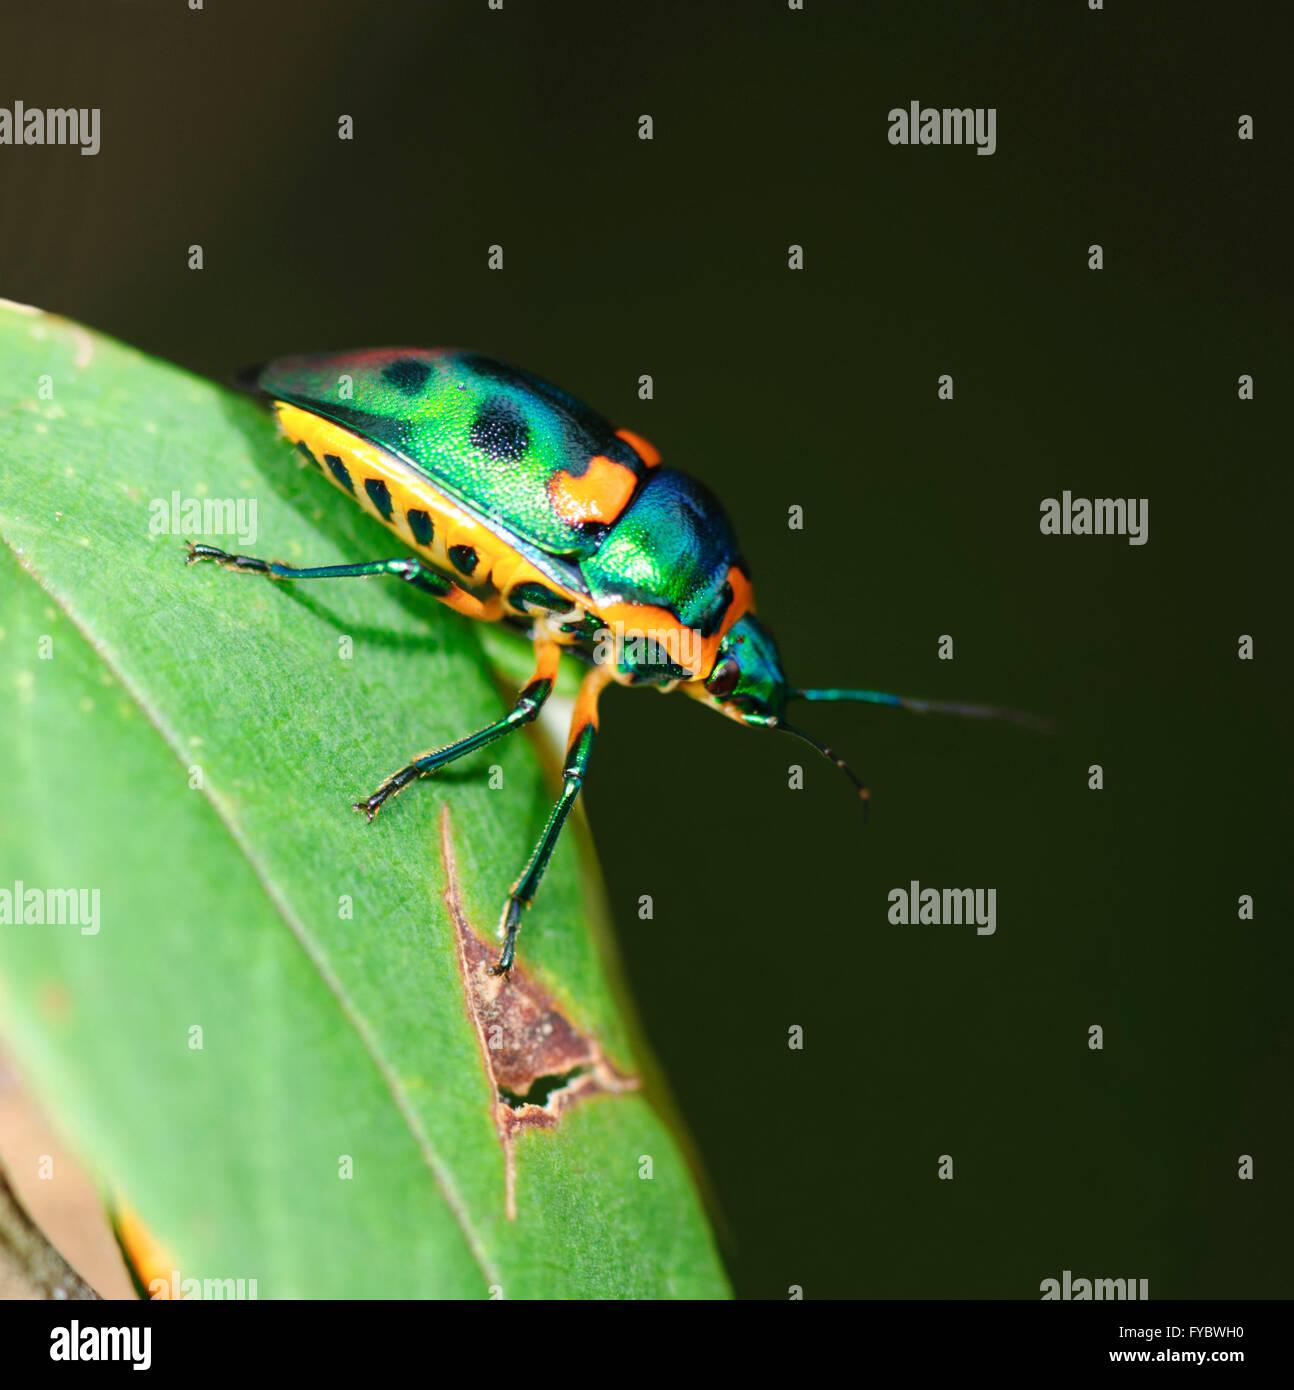 Green Jewel Bug (Lampromicra senator), New South Wales, Australia - Stock Image